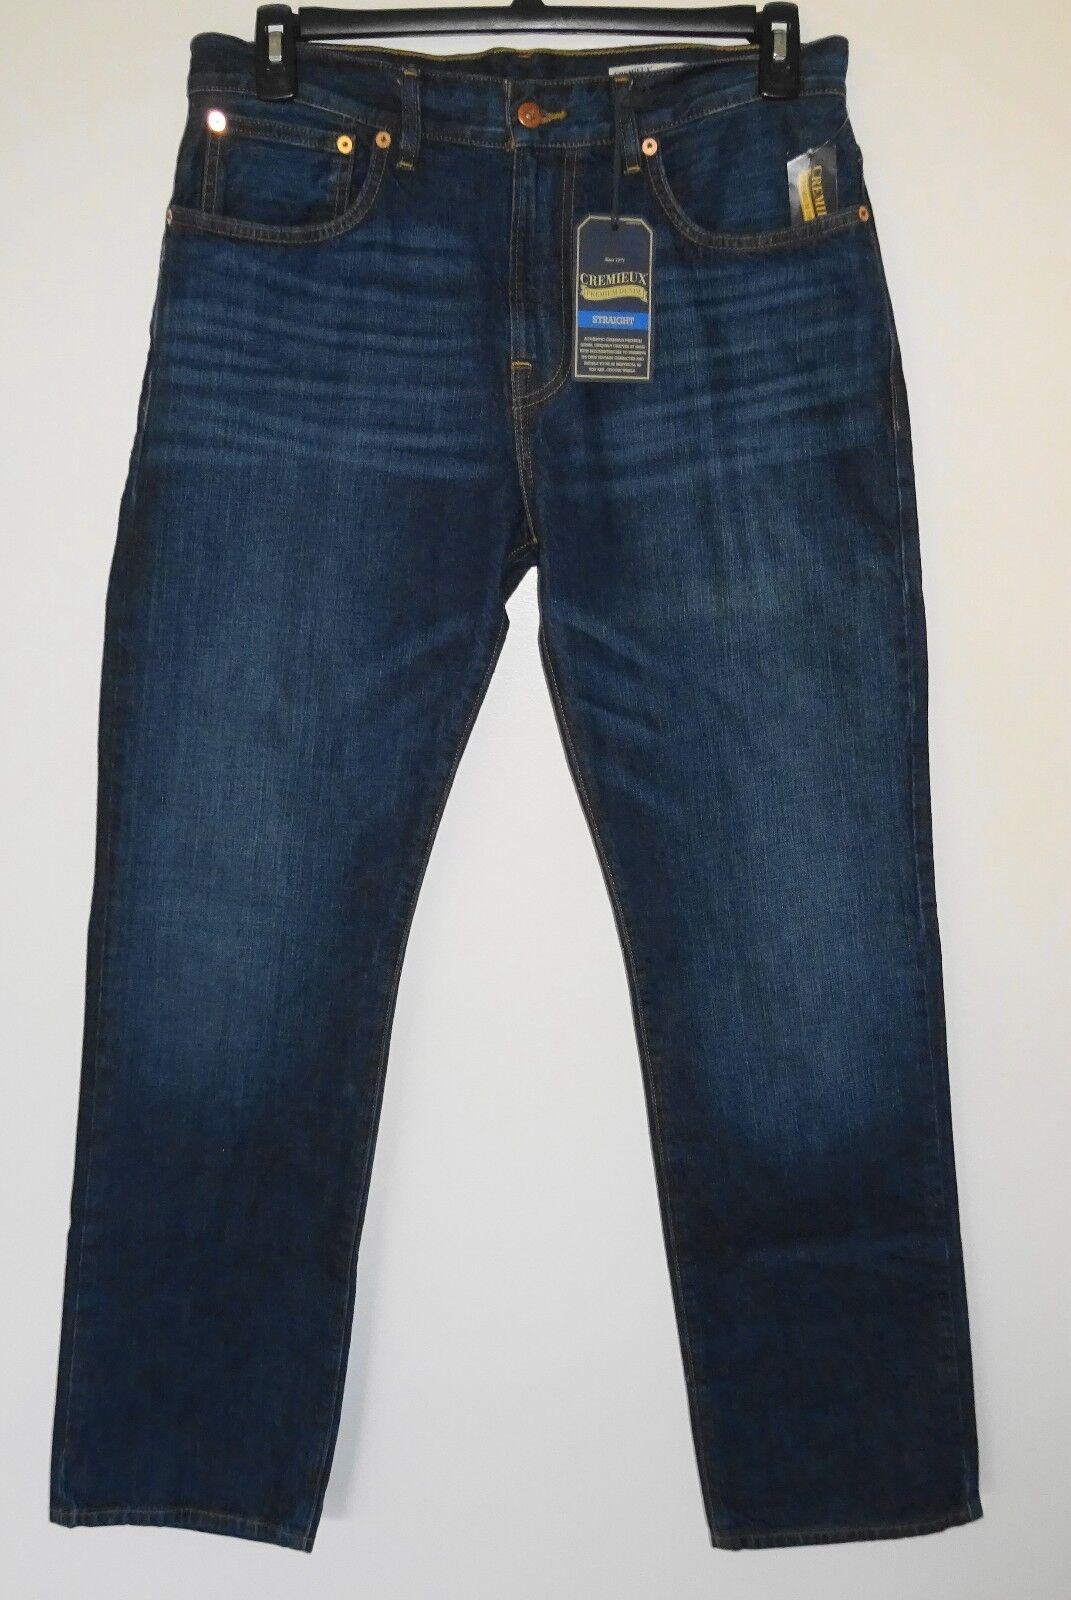 Cremieux Premium bluee Jeans  Original Classic Fit Straight Leg  40x32 NWT ()